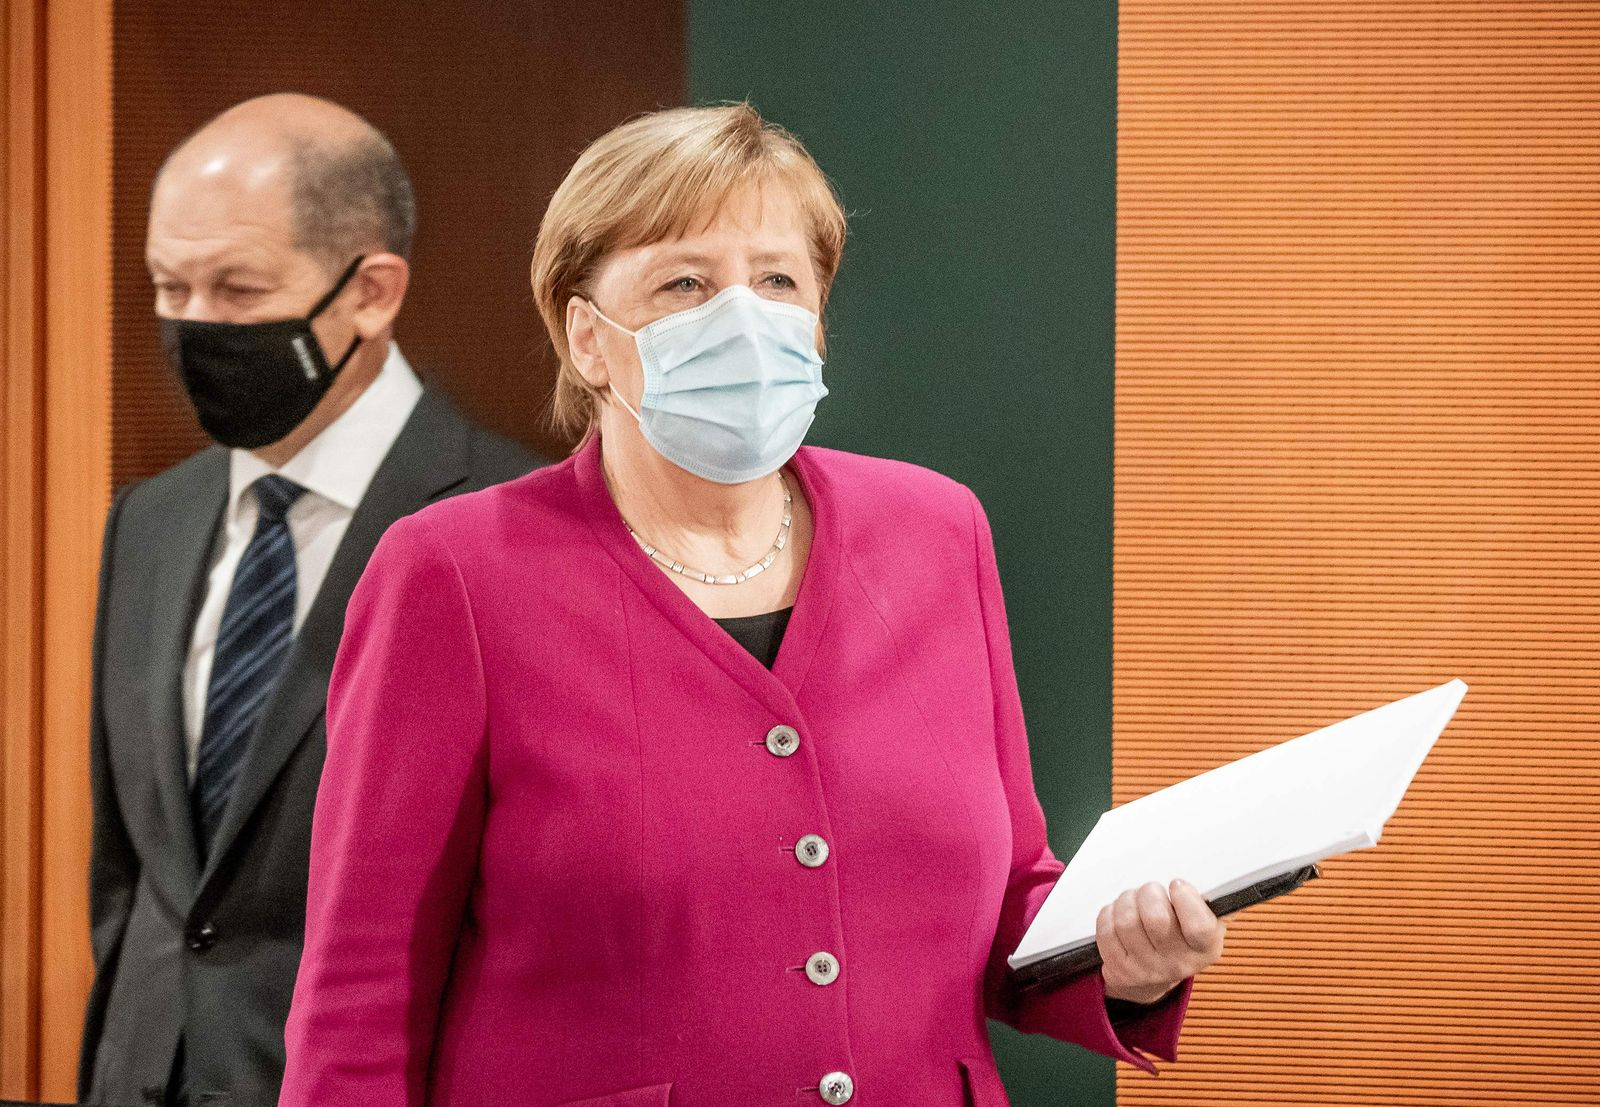 GERMANY-POLITICS-CABINET-GOVERNMENT